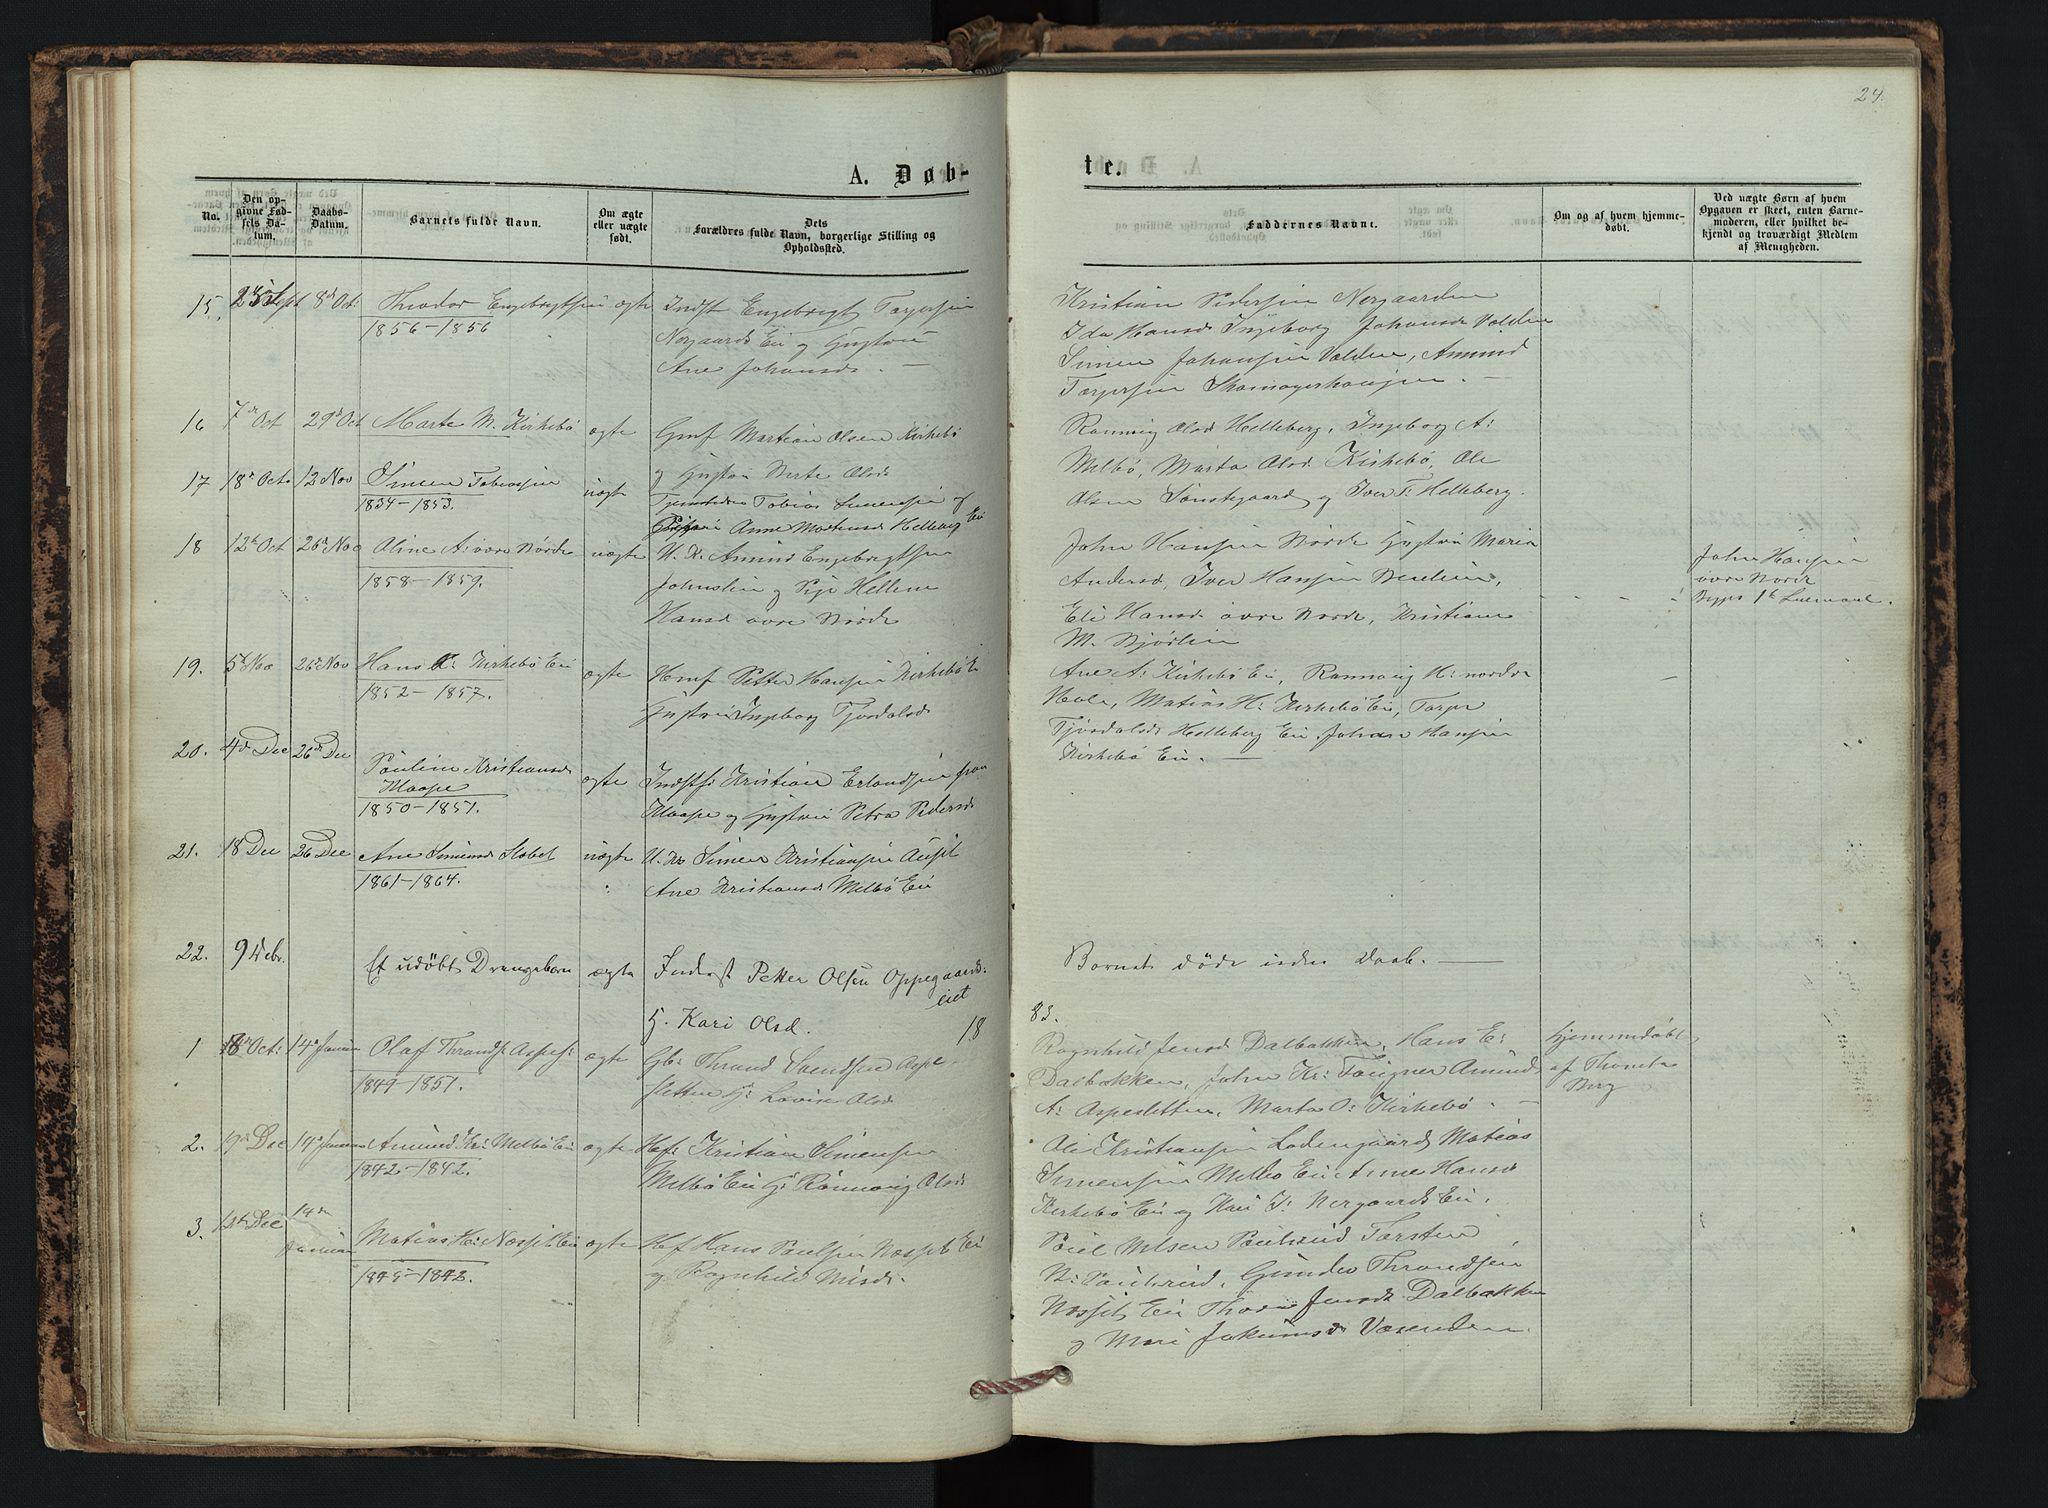 SAH, Vestre Gausdal prestekontor, Klokkerbok nr. 2, 1874-1897, s. 24